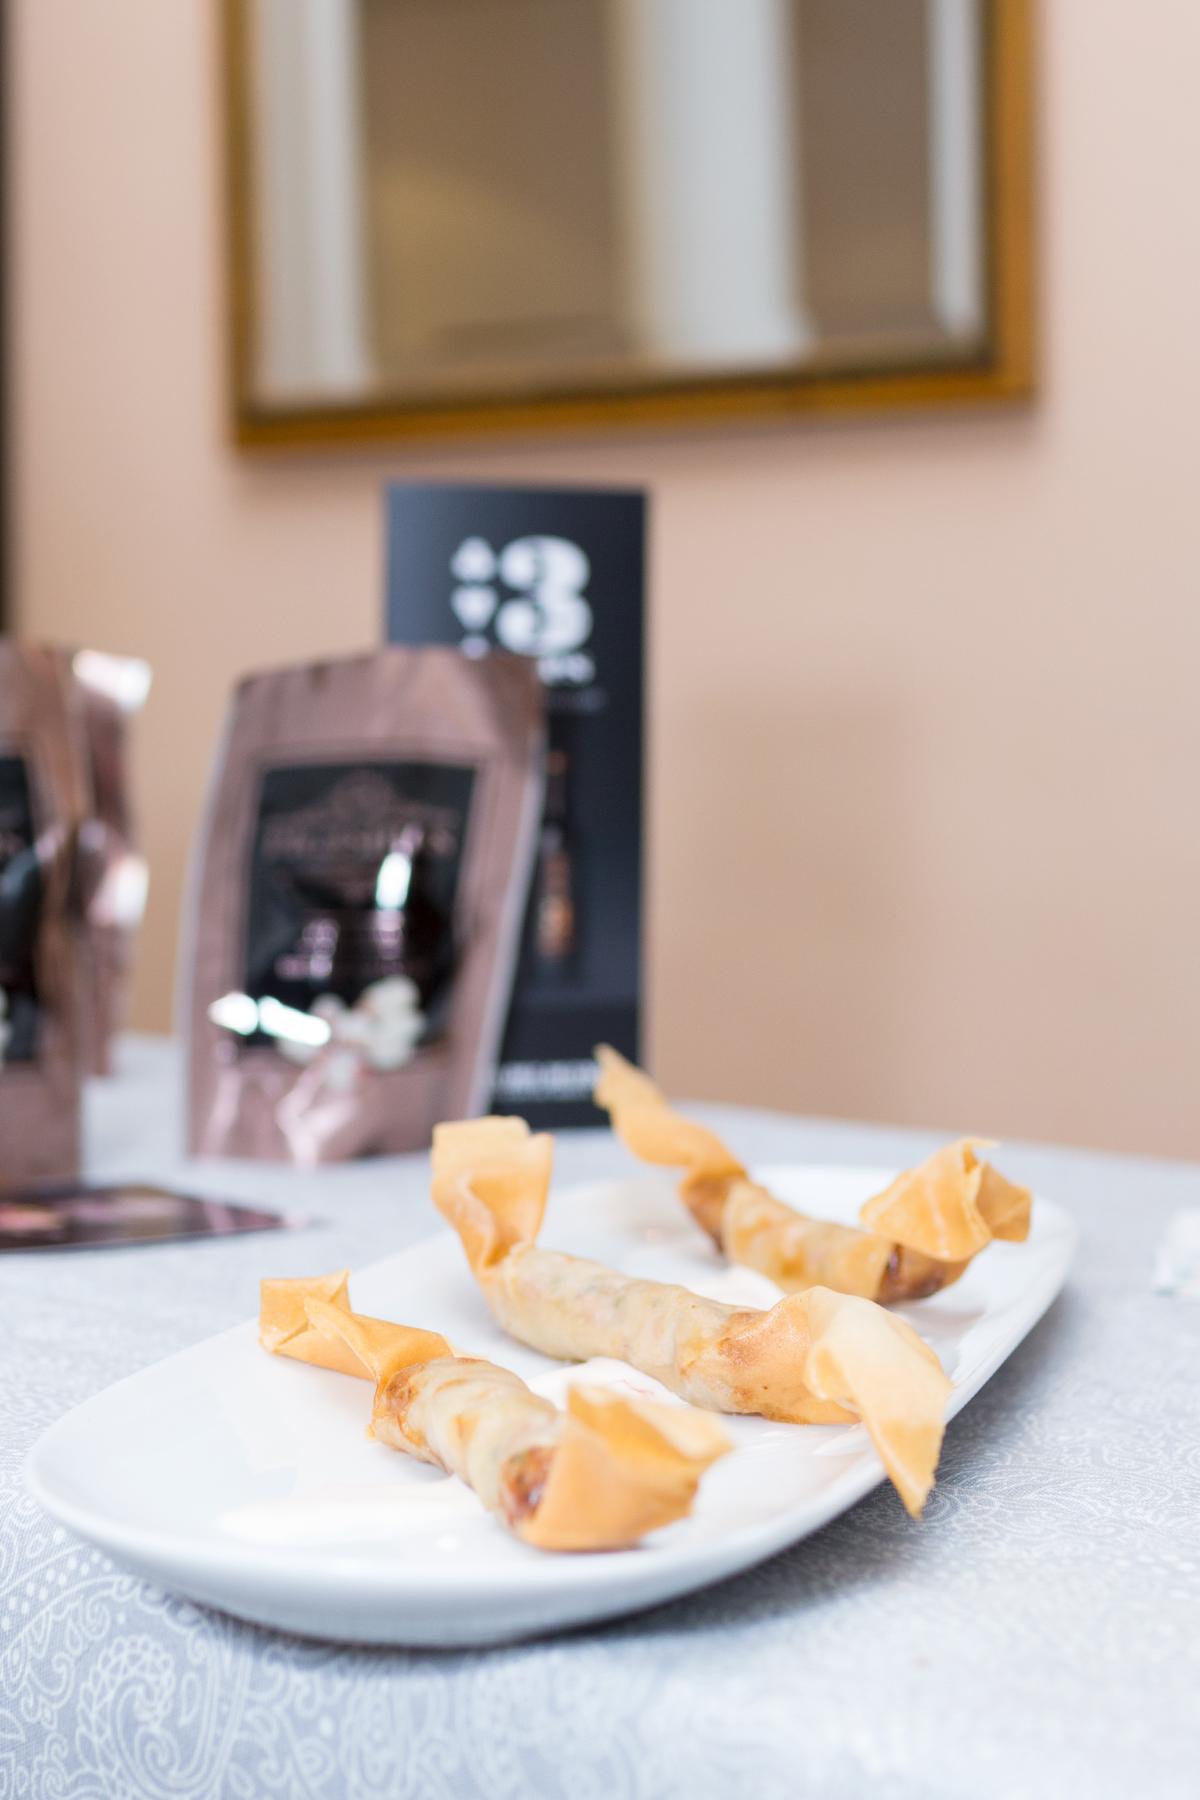 Crounchy de tartar salchichón Picasines